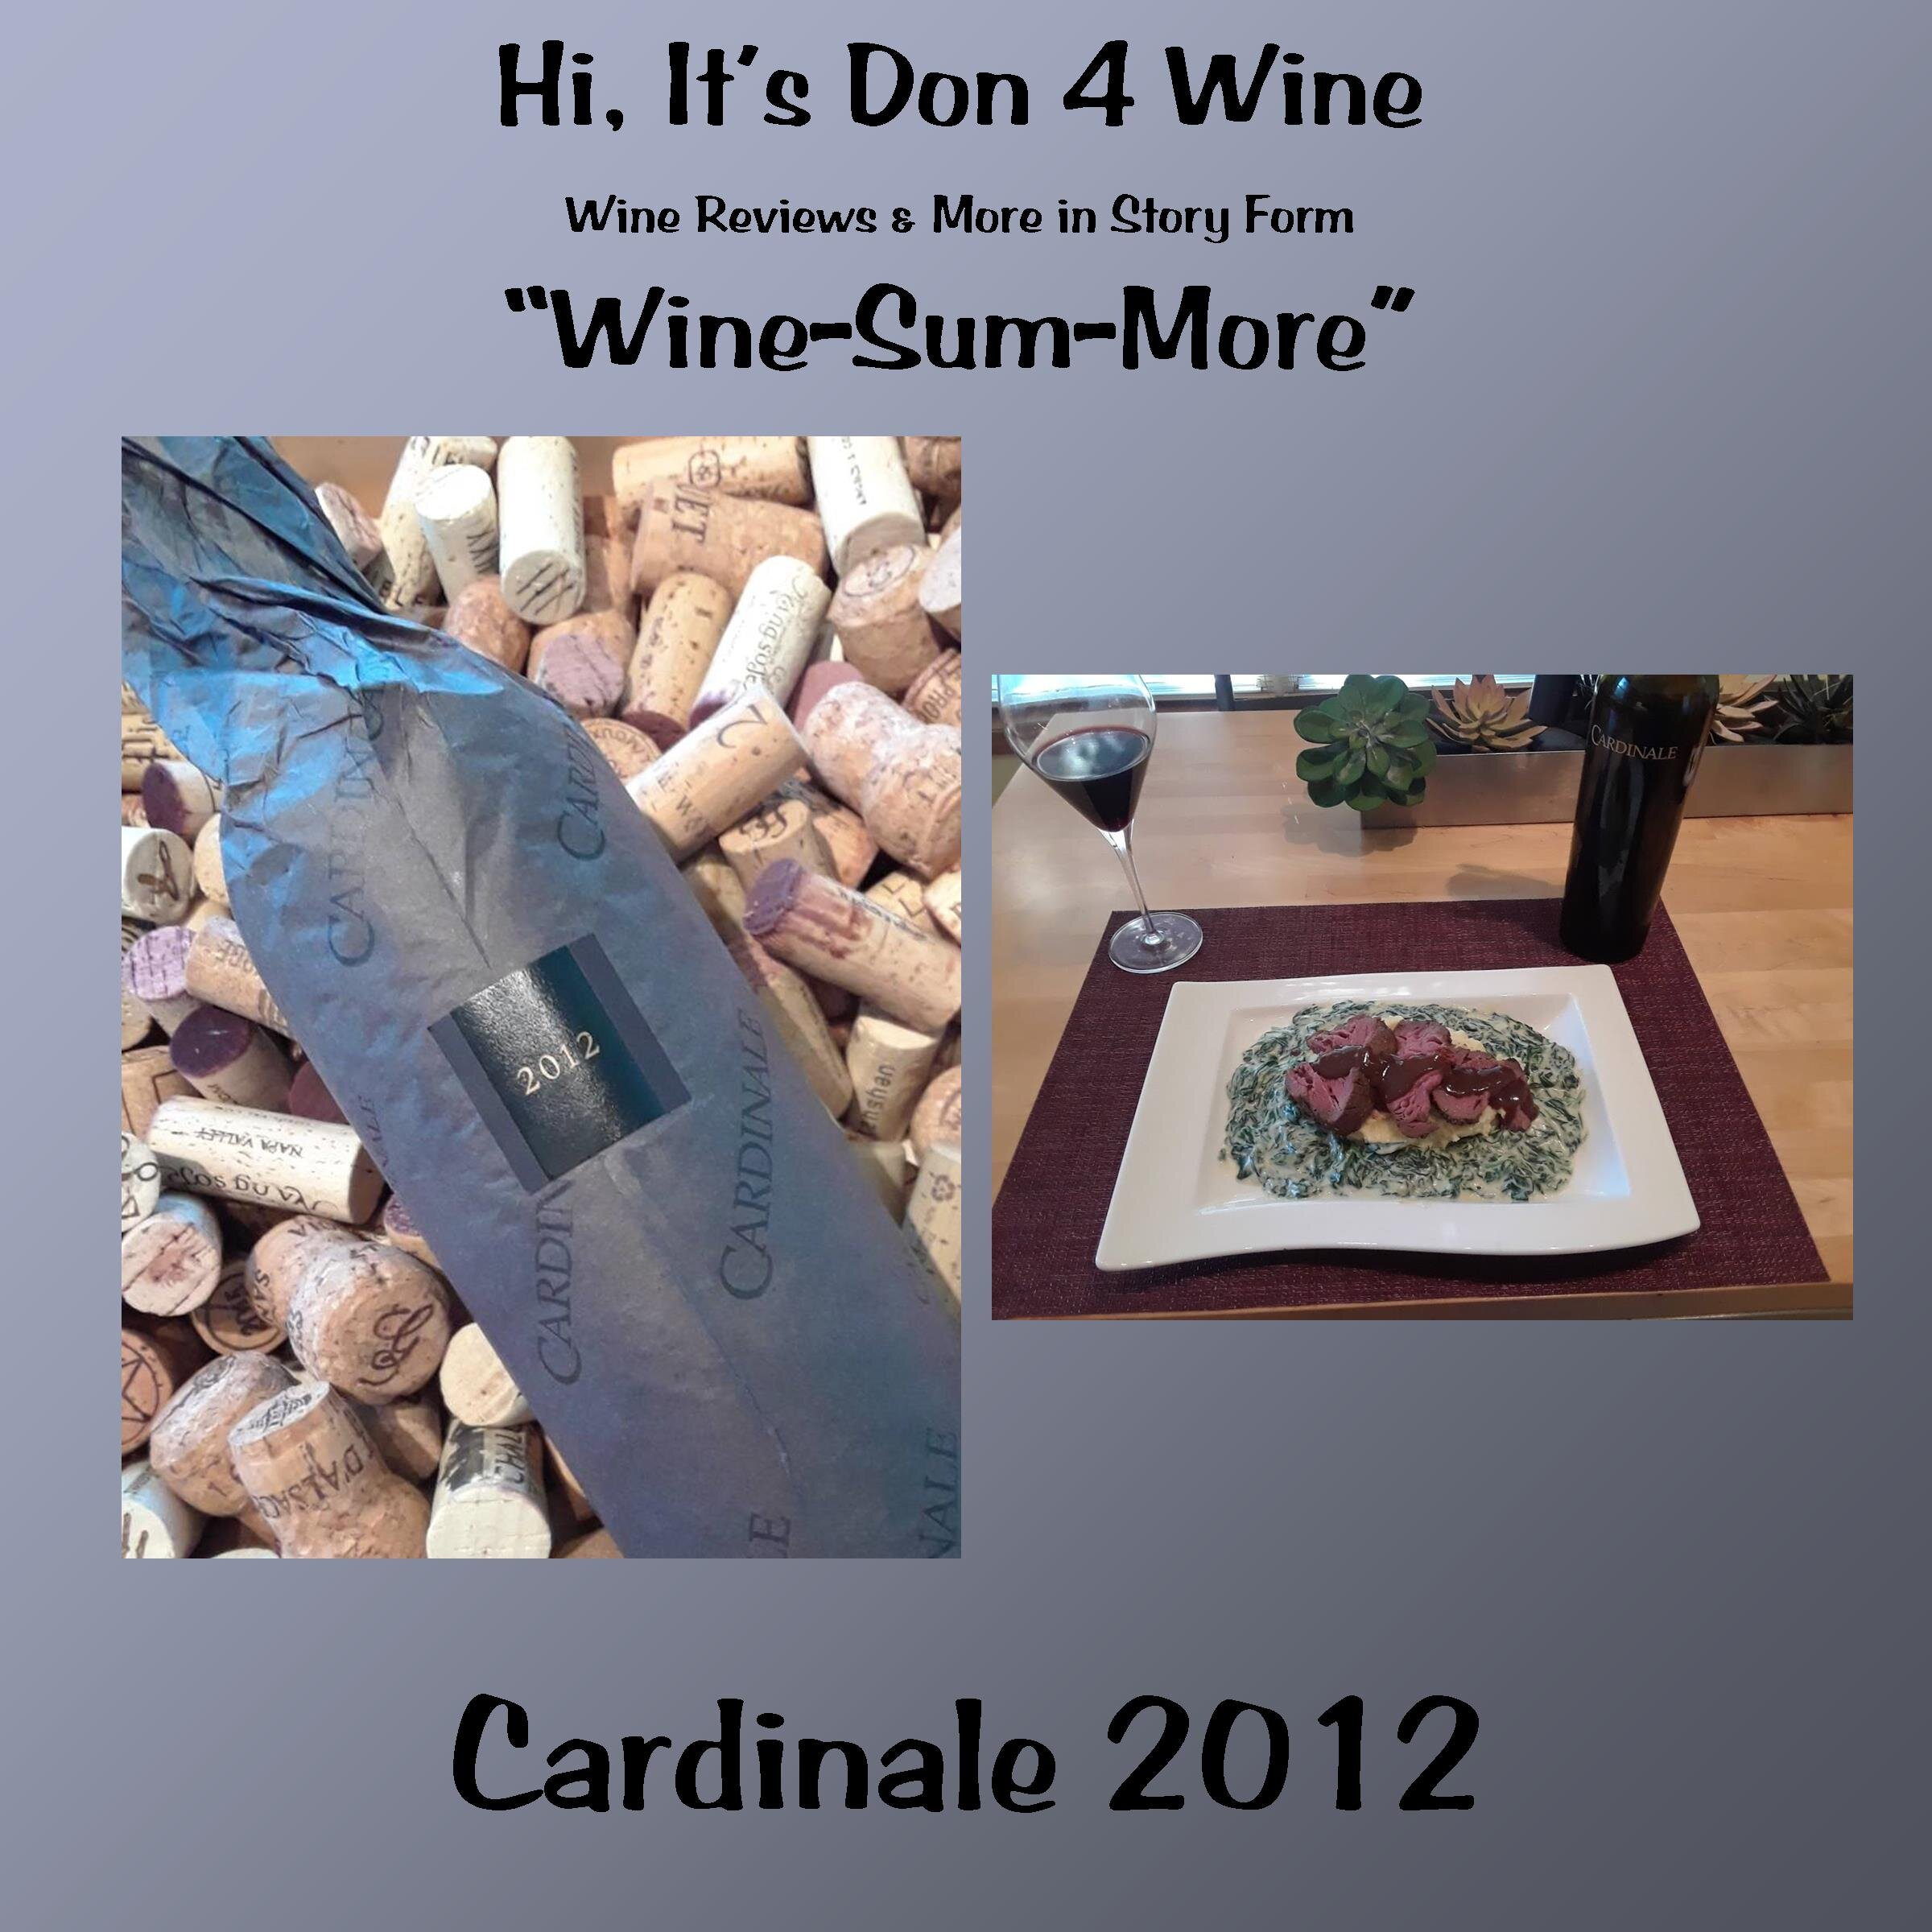 cardinale 2012.jpg